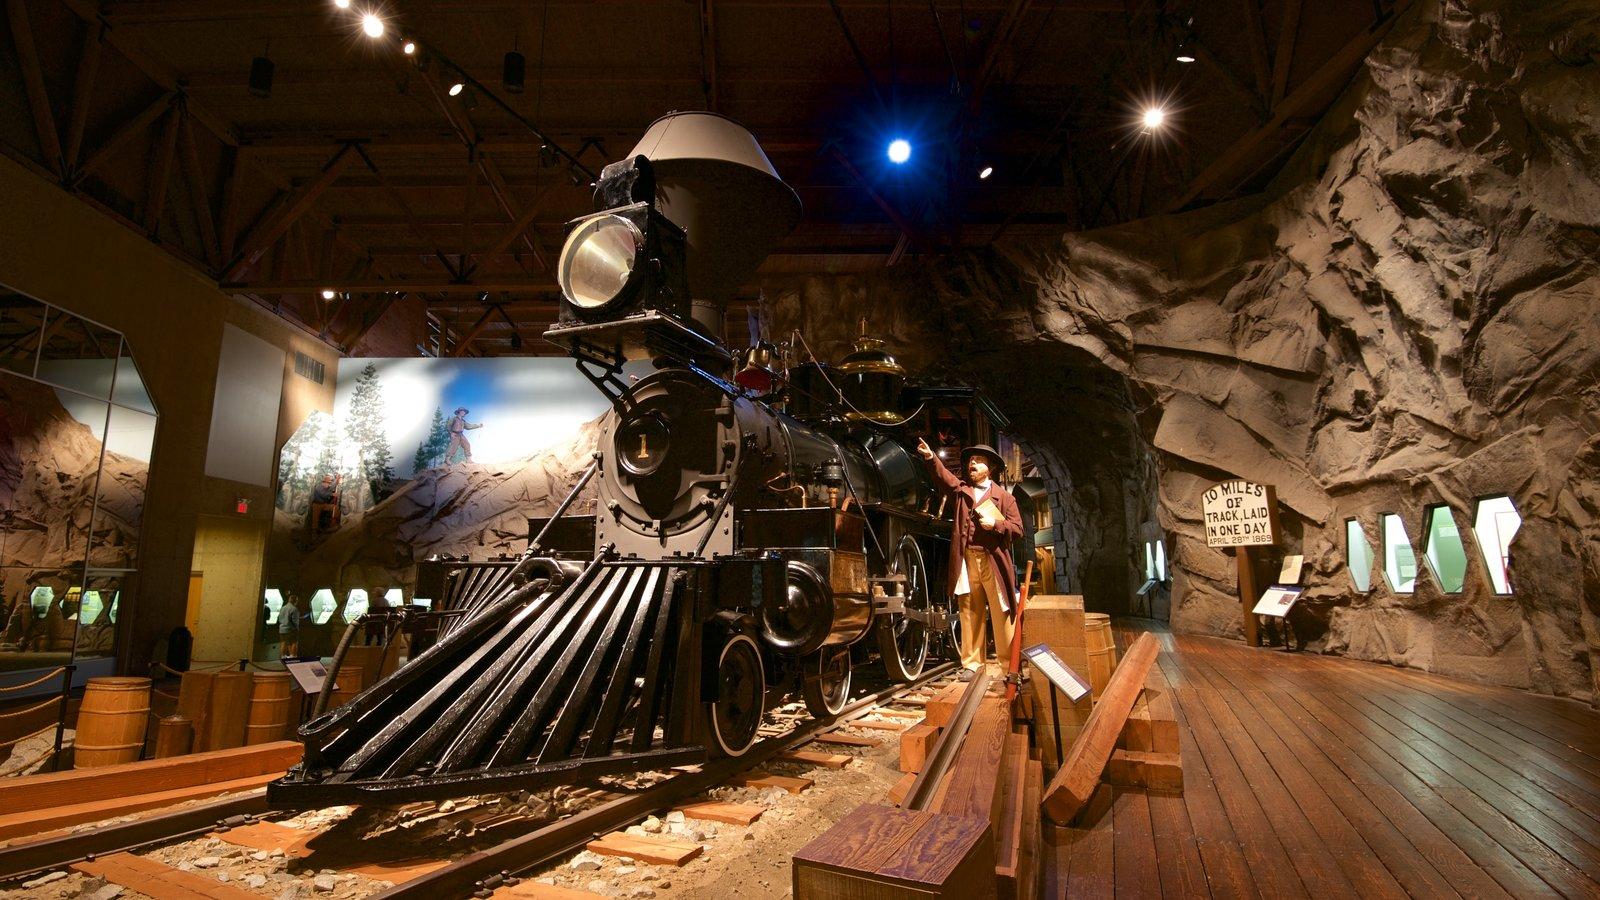 California State Railroad Museum mostrando vistas internas